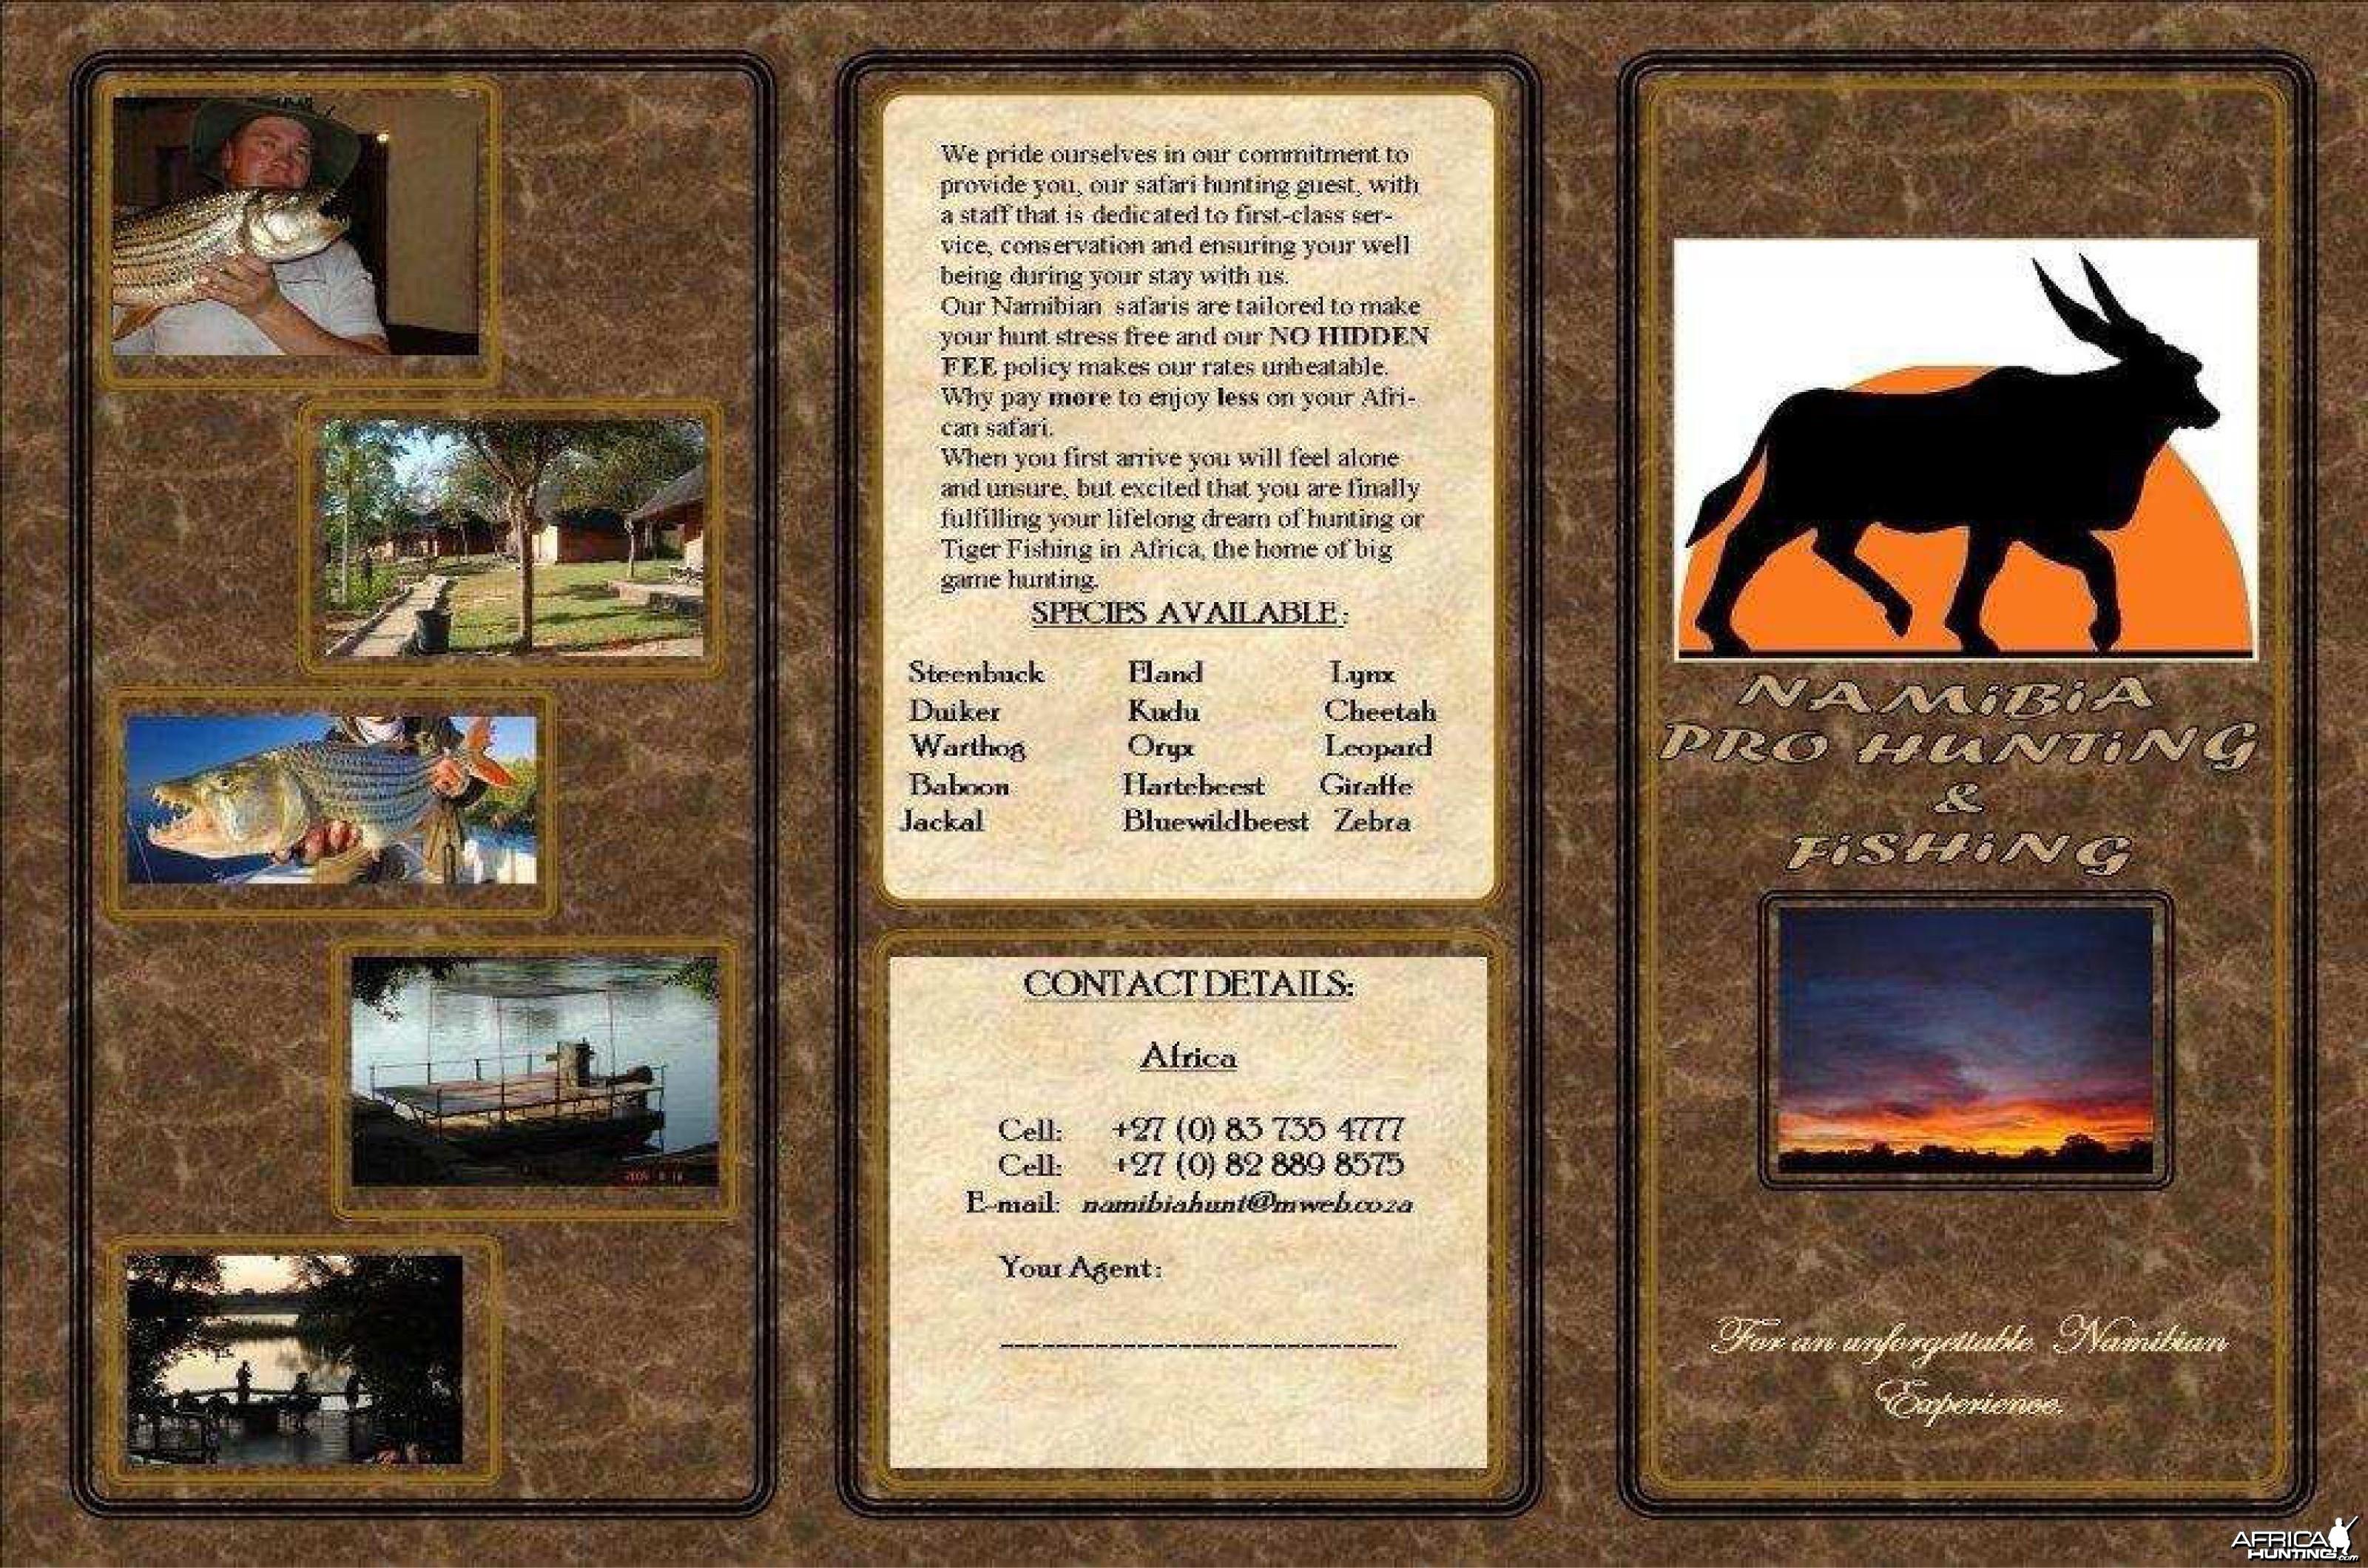 NAMIBIA PRO HUNTING & FISHING 2